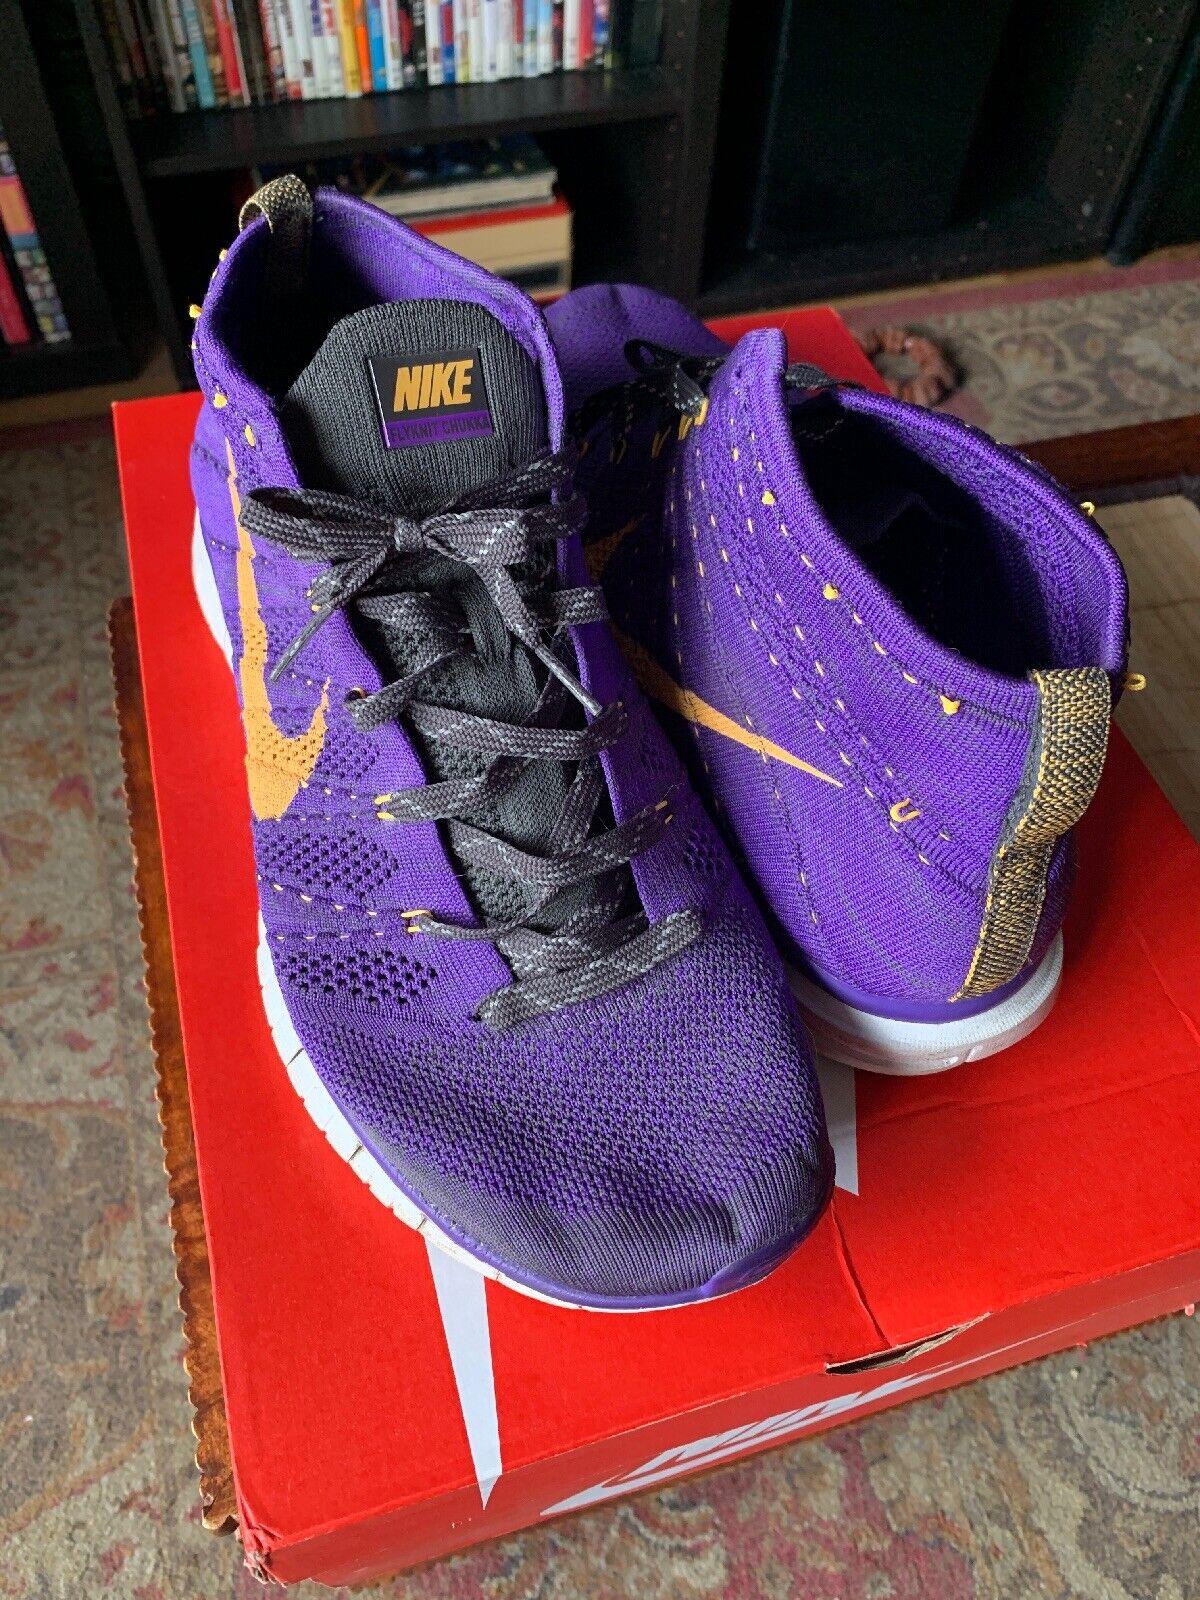 Nike 639700-500 Grape Men's Free Flyknit Chukka Running shoes Size US 12